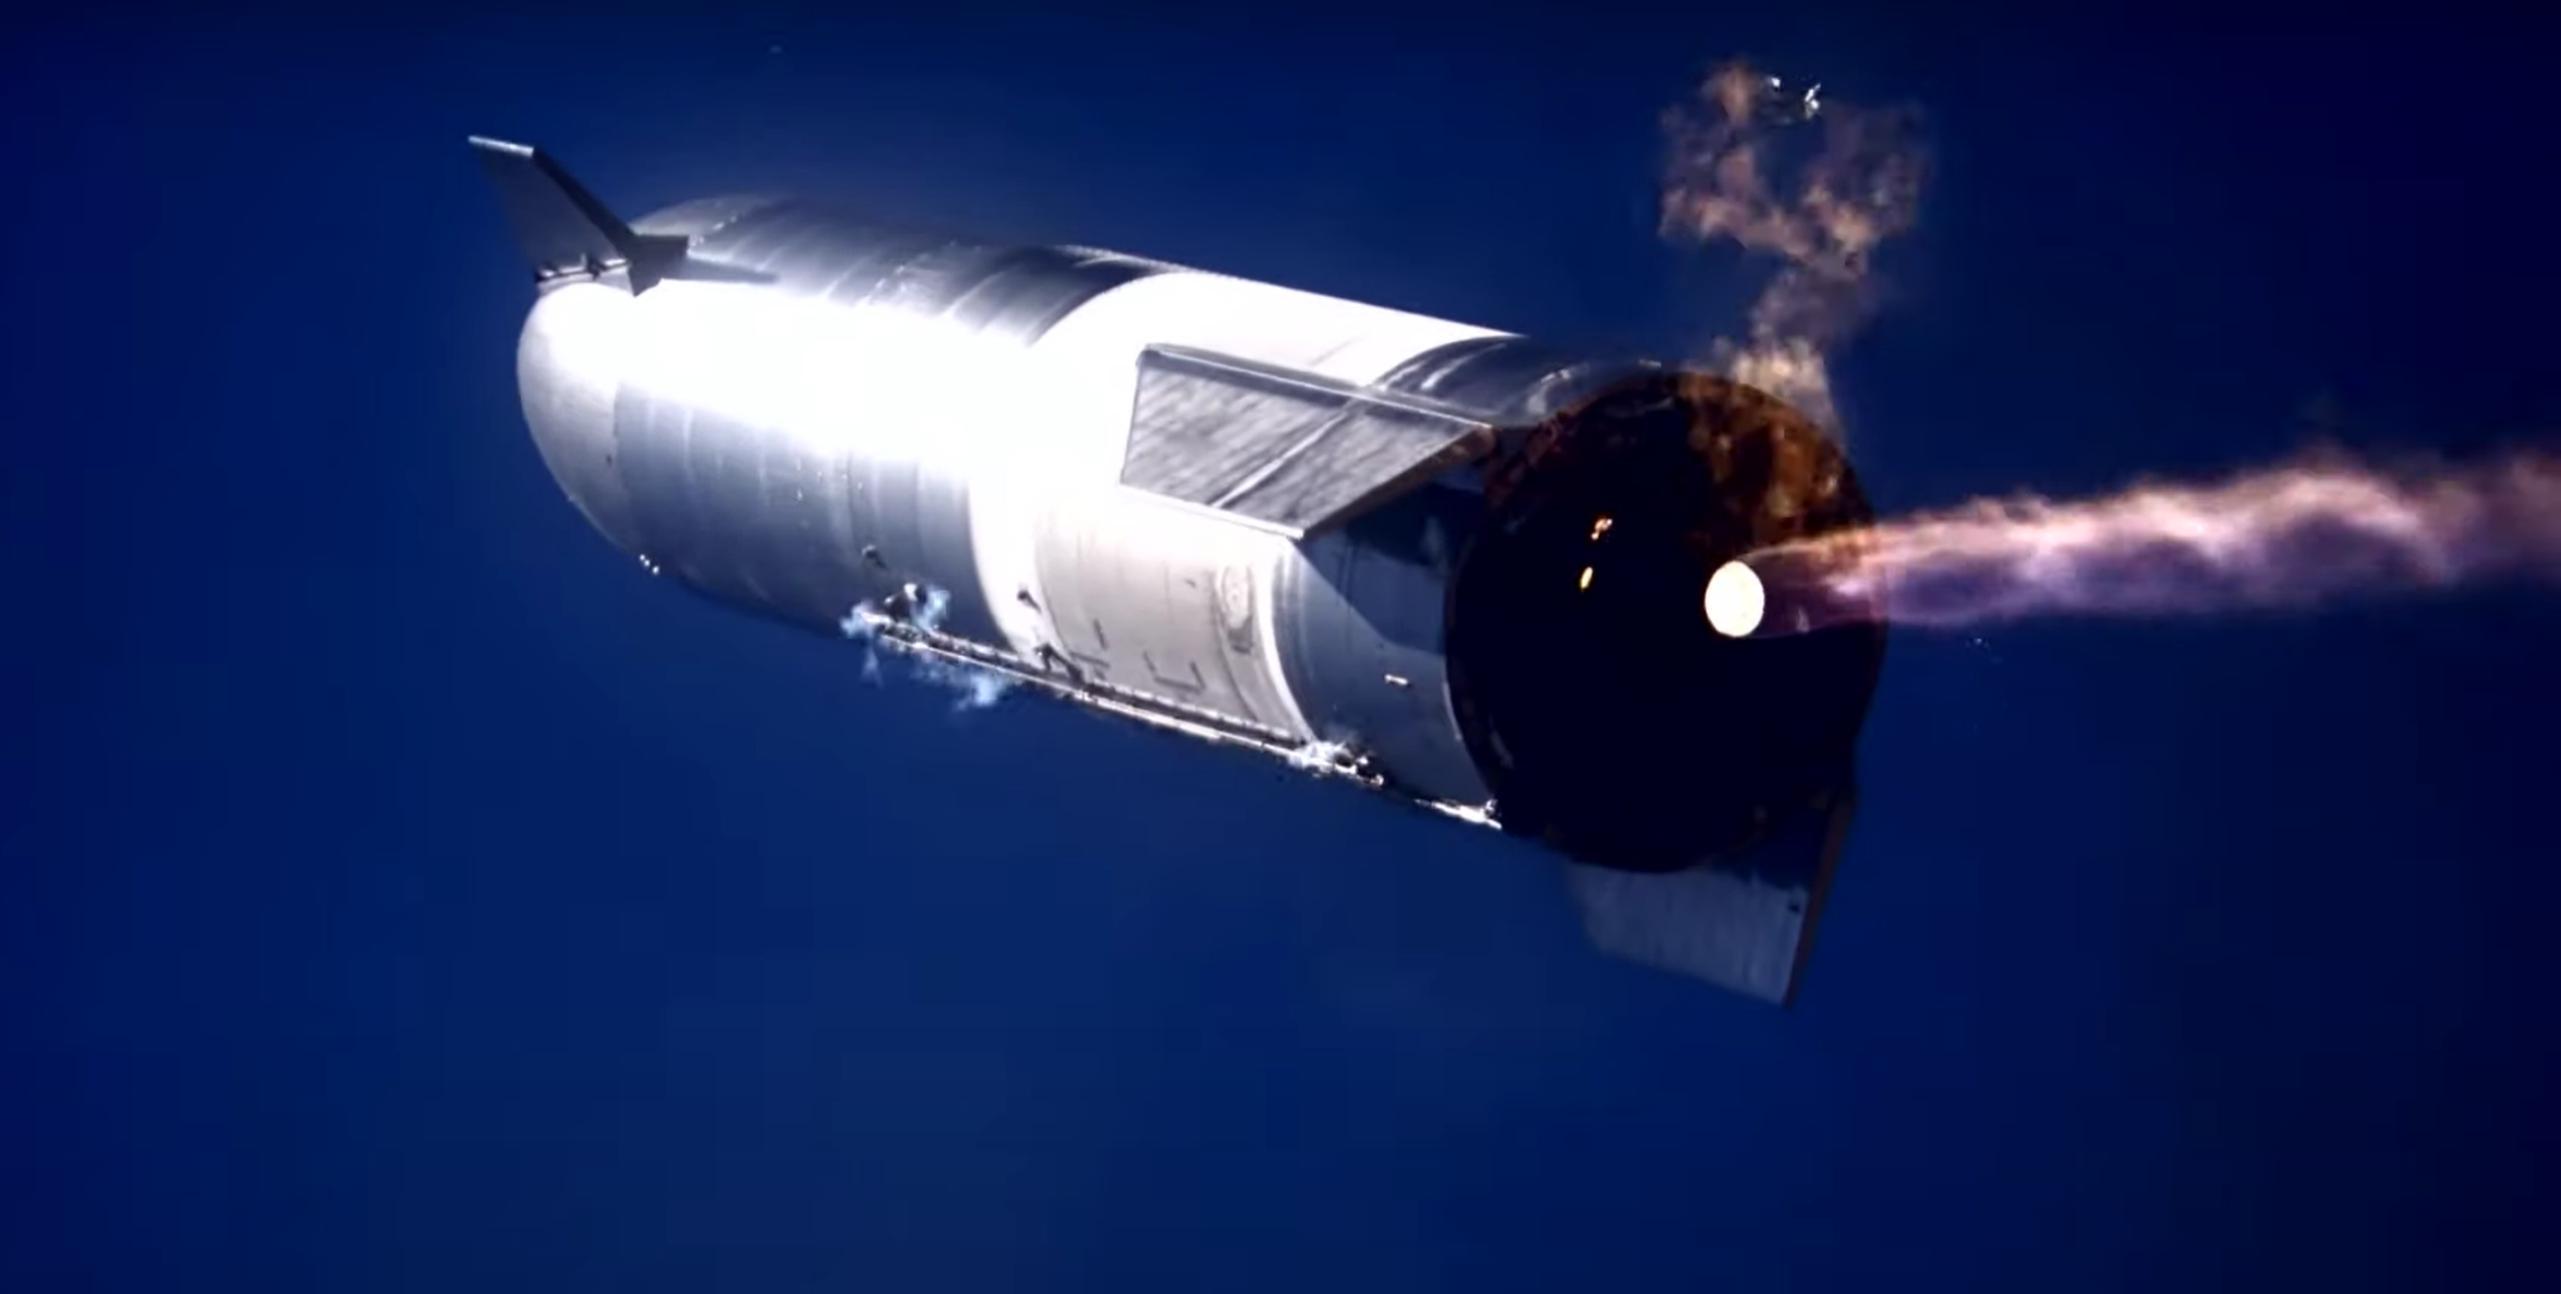 Starship SN9 launch (SpaceX) landing attempt 3 crop (c)